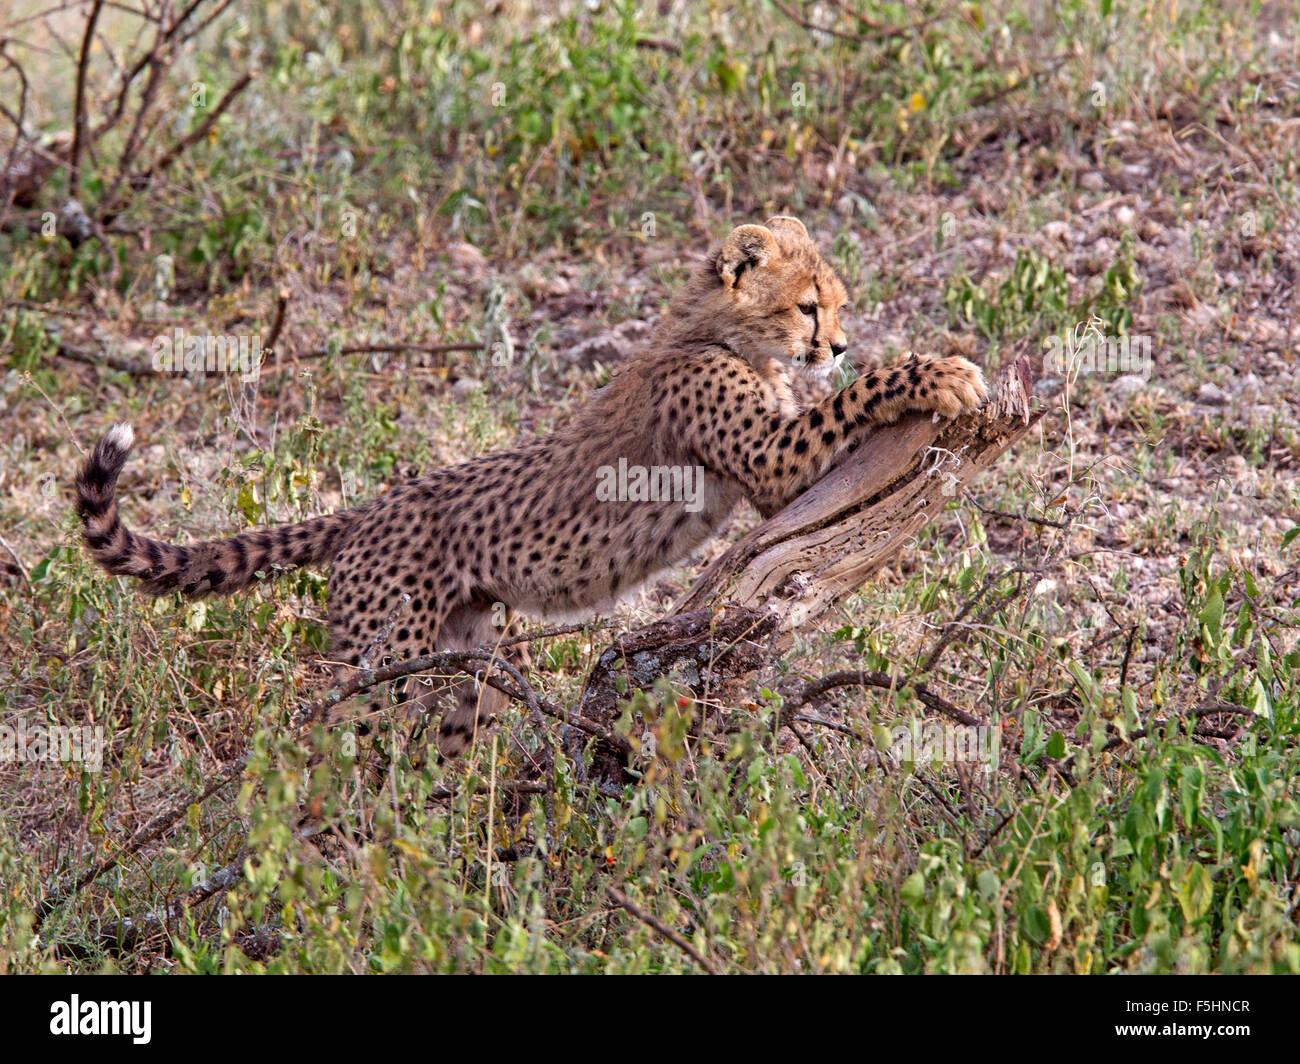 Cheetah cub on tree stump Stock Photo